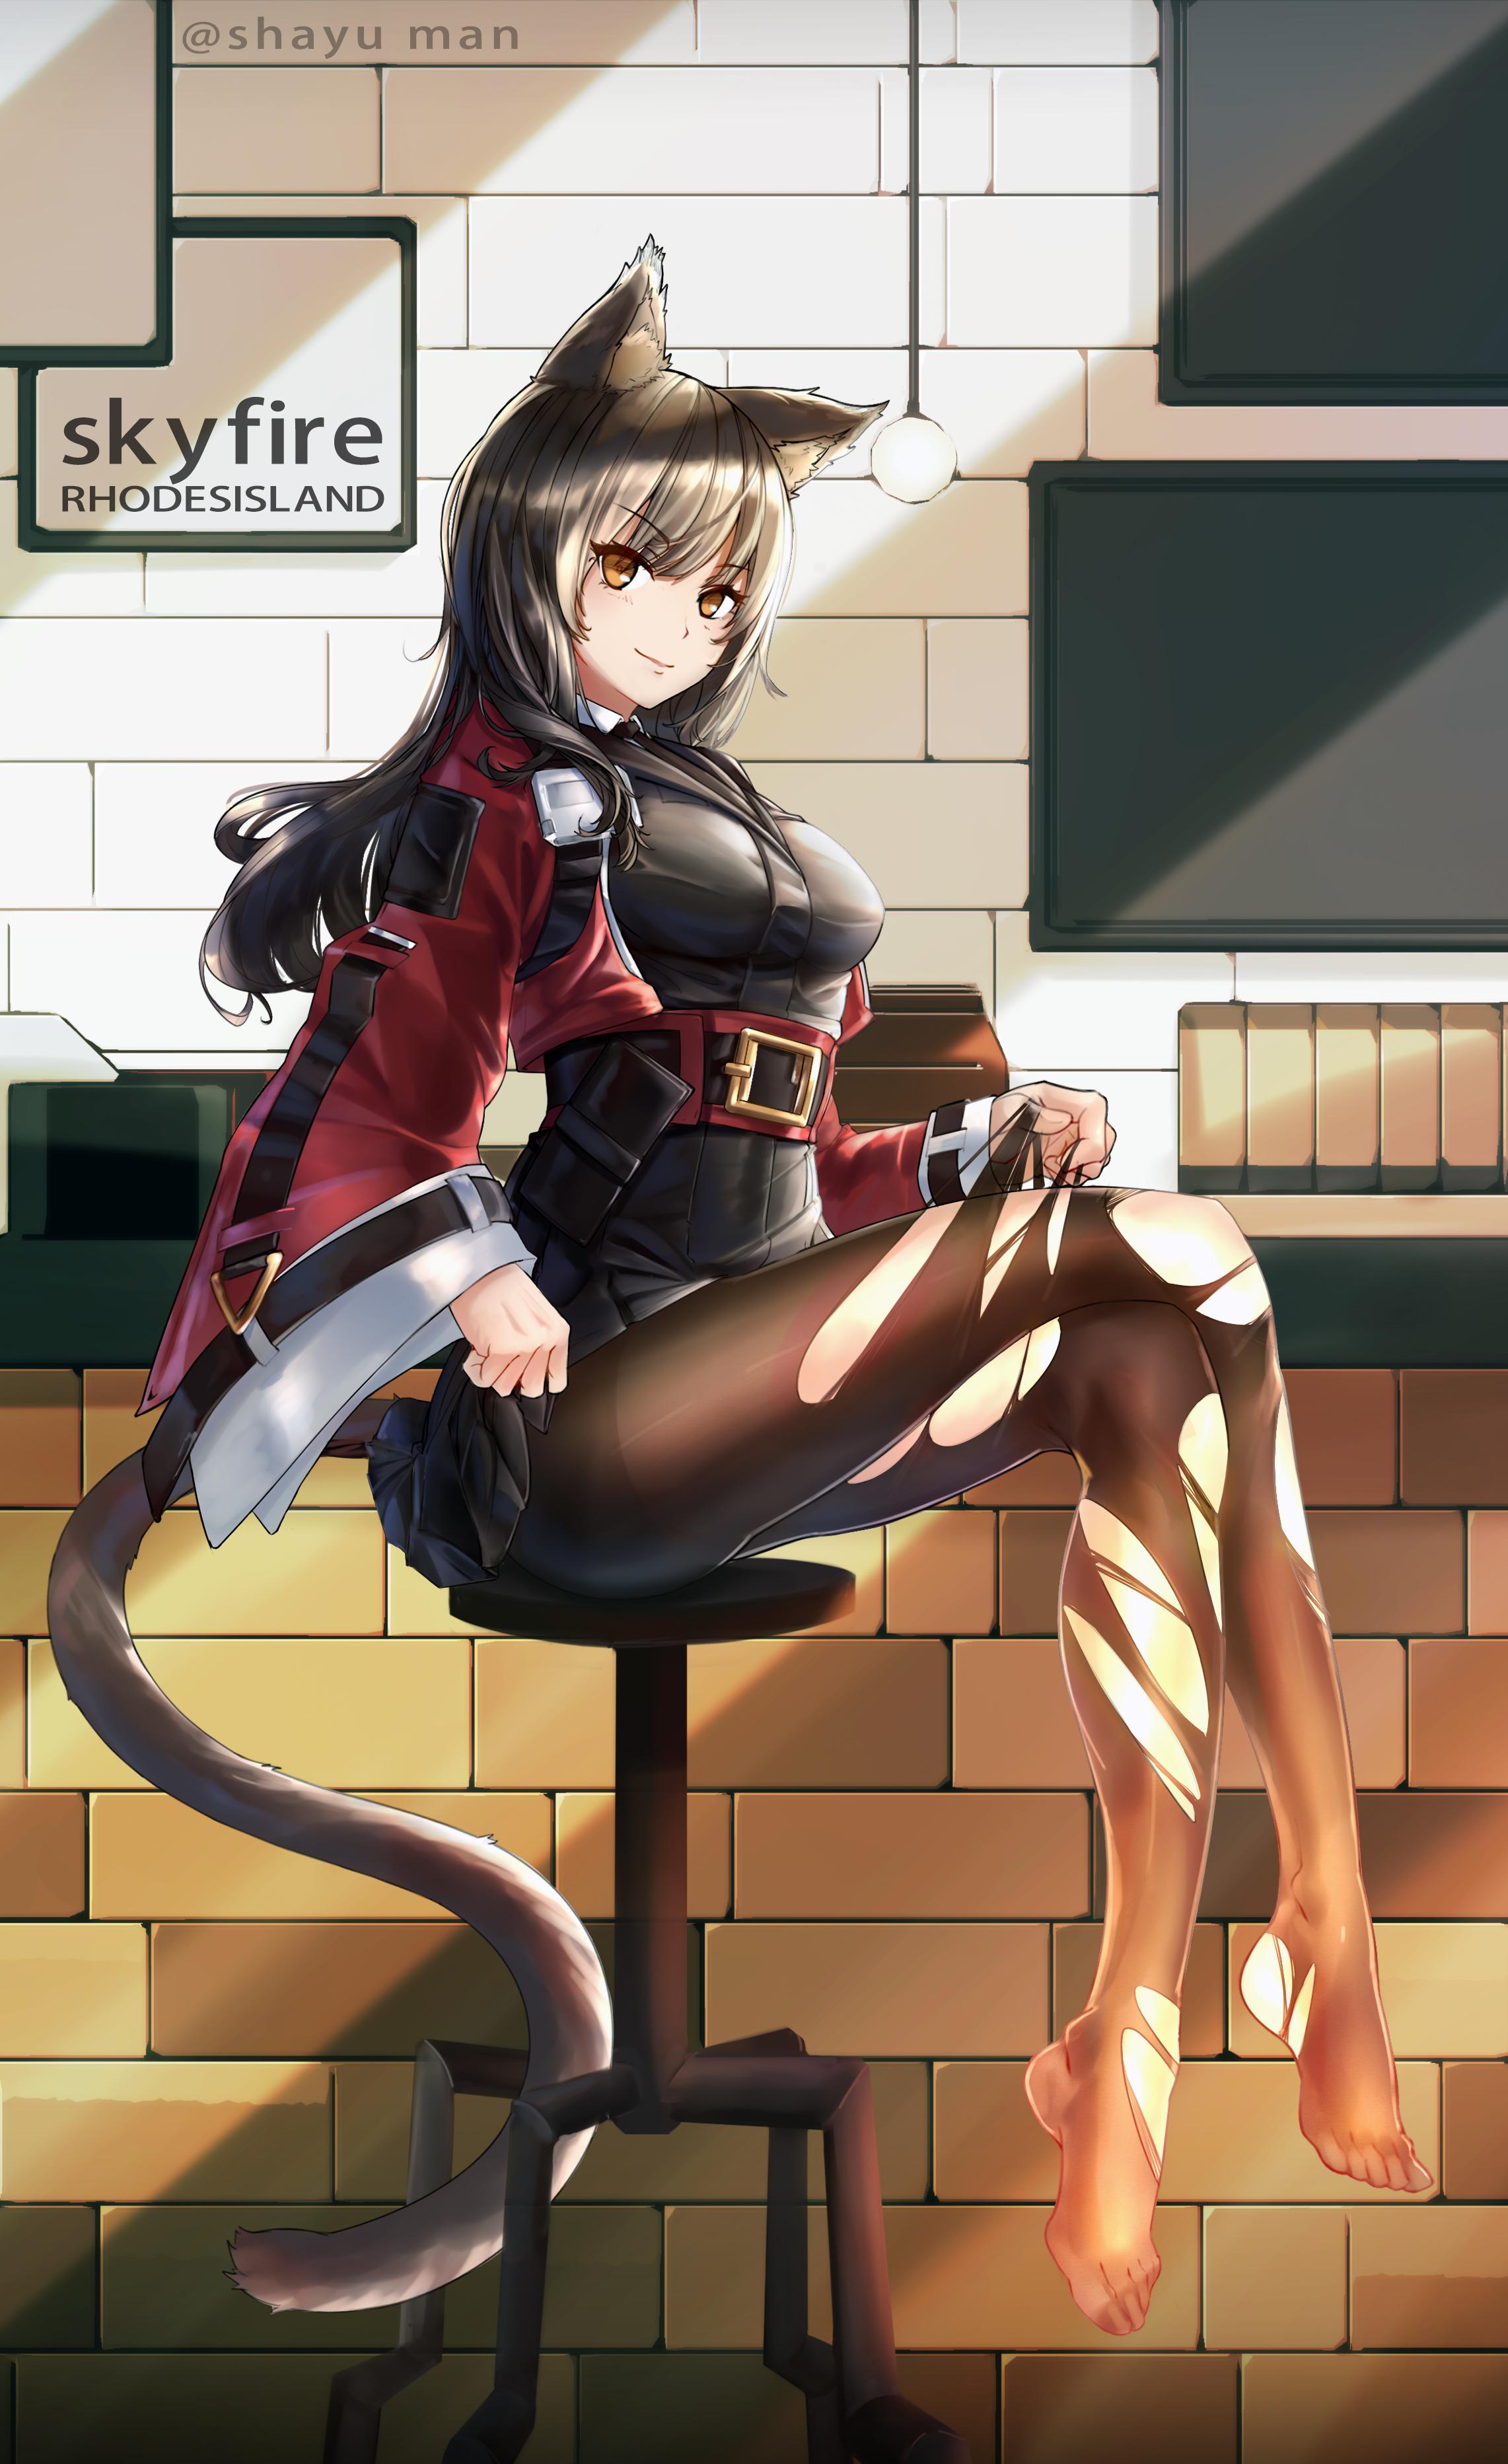 spread legs, thighs, fu-ta, anime, anime girls, simple